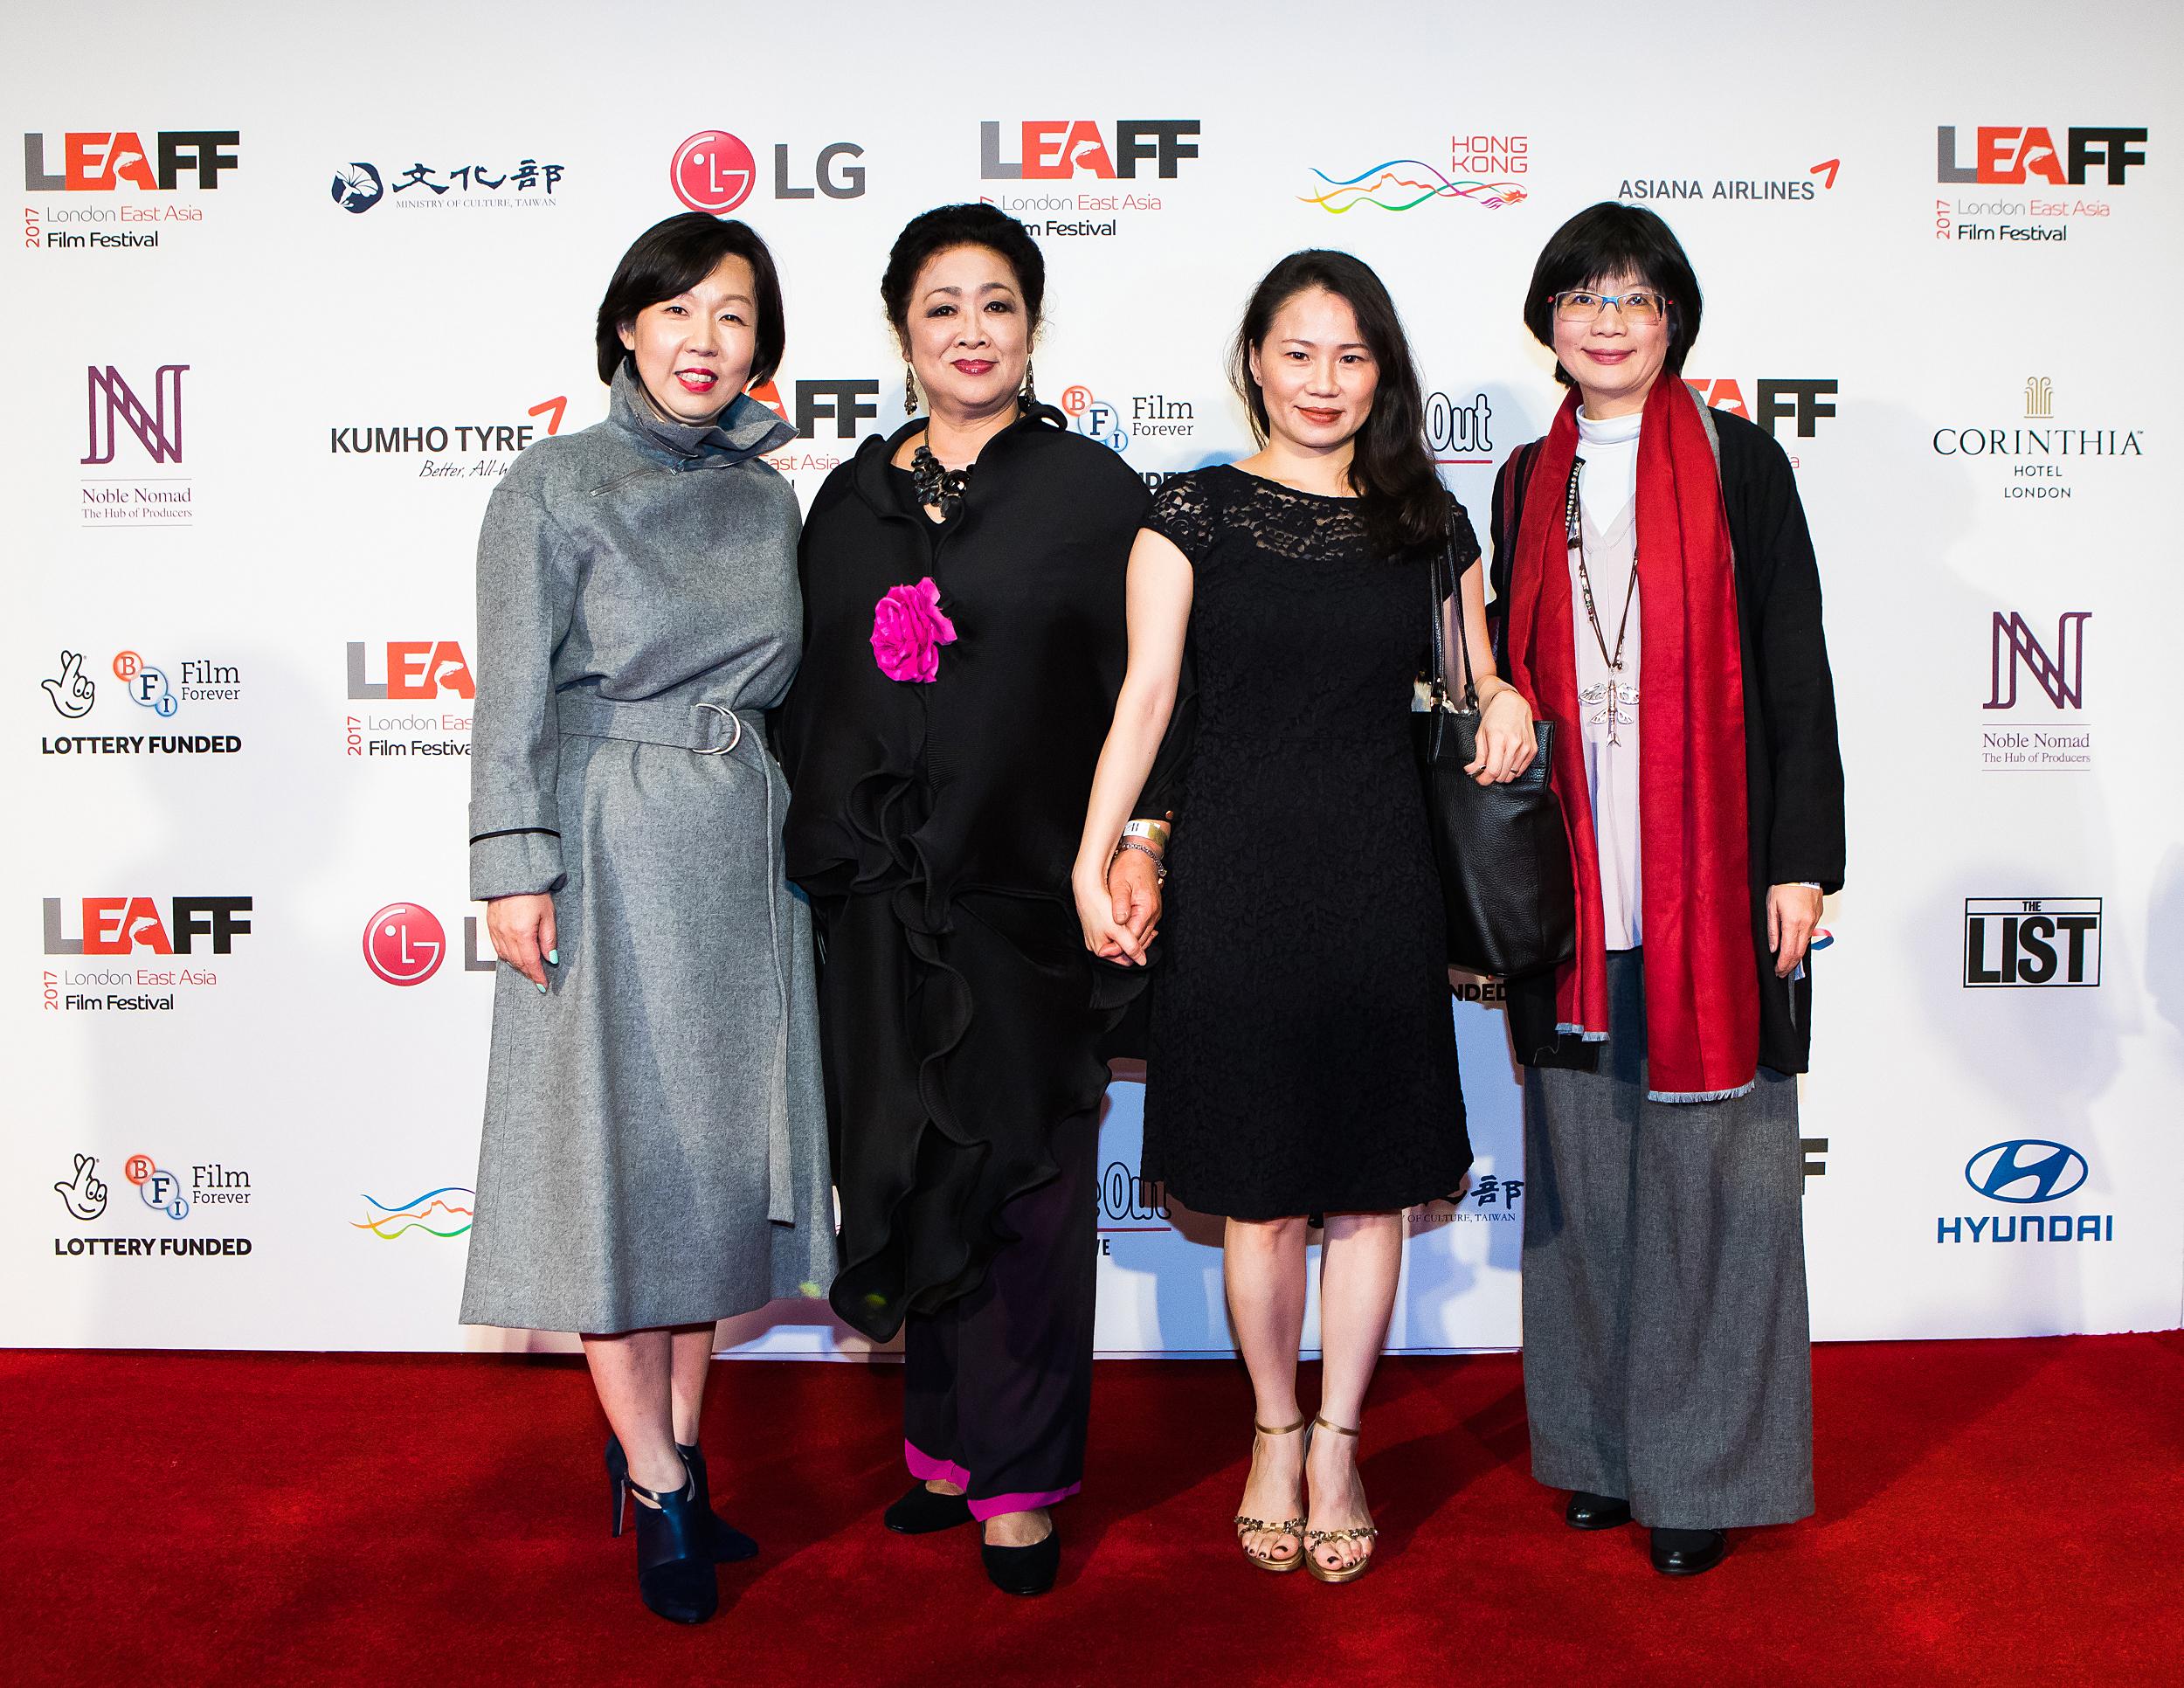 2017 LEAFF Opening Gala (3).jpg